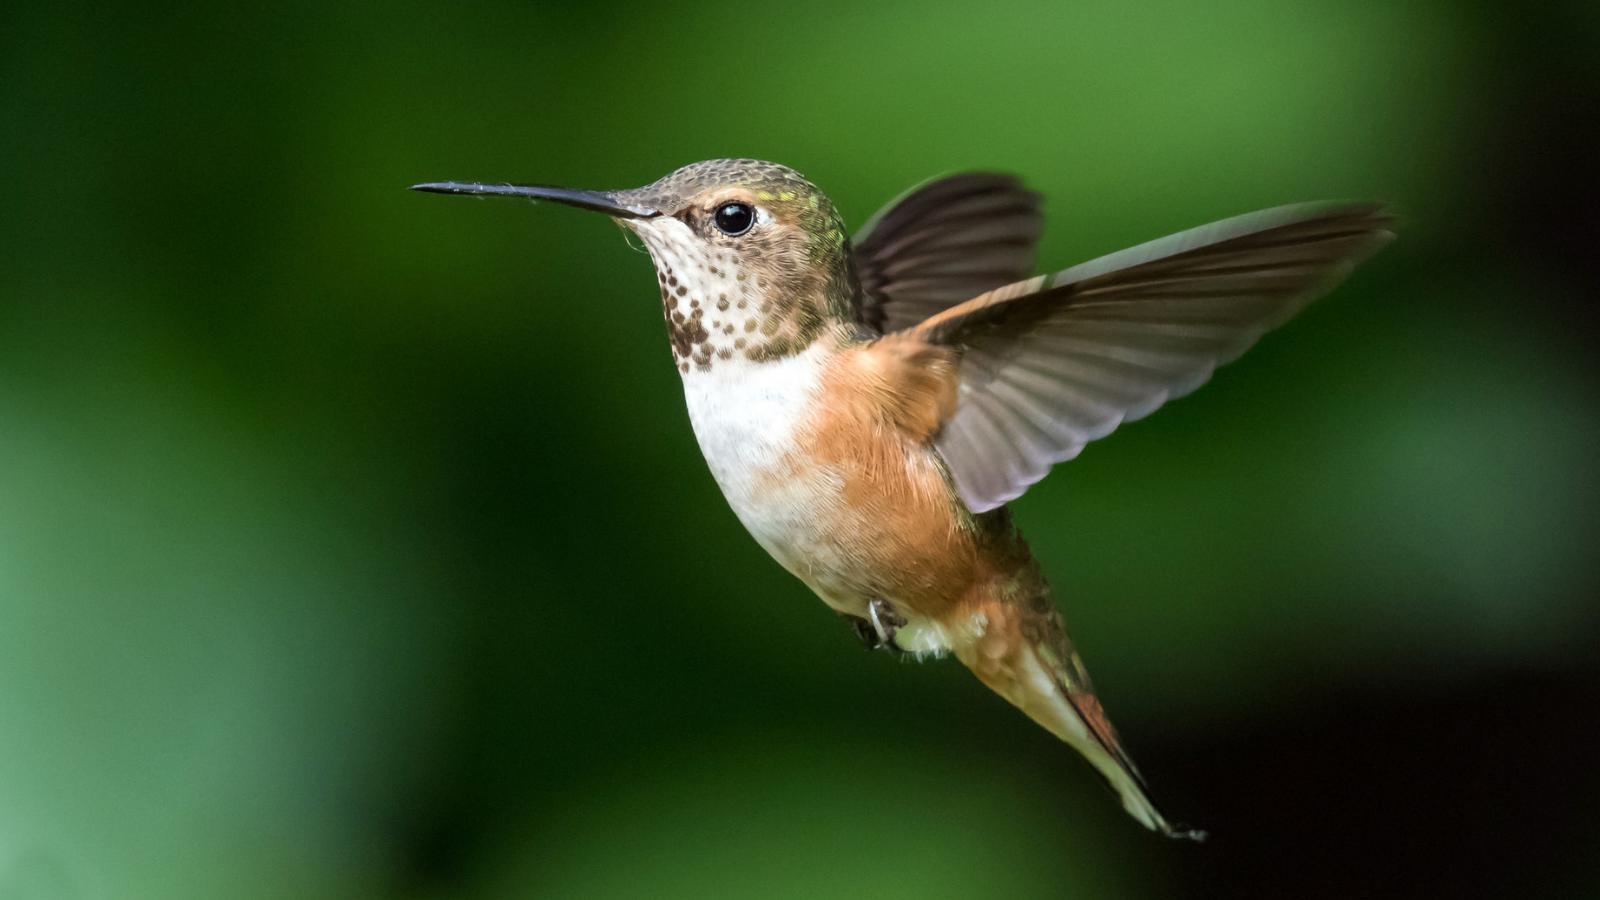 Rufous Hummingbird by Mick Thompson